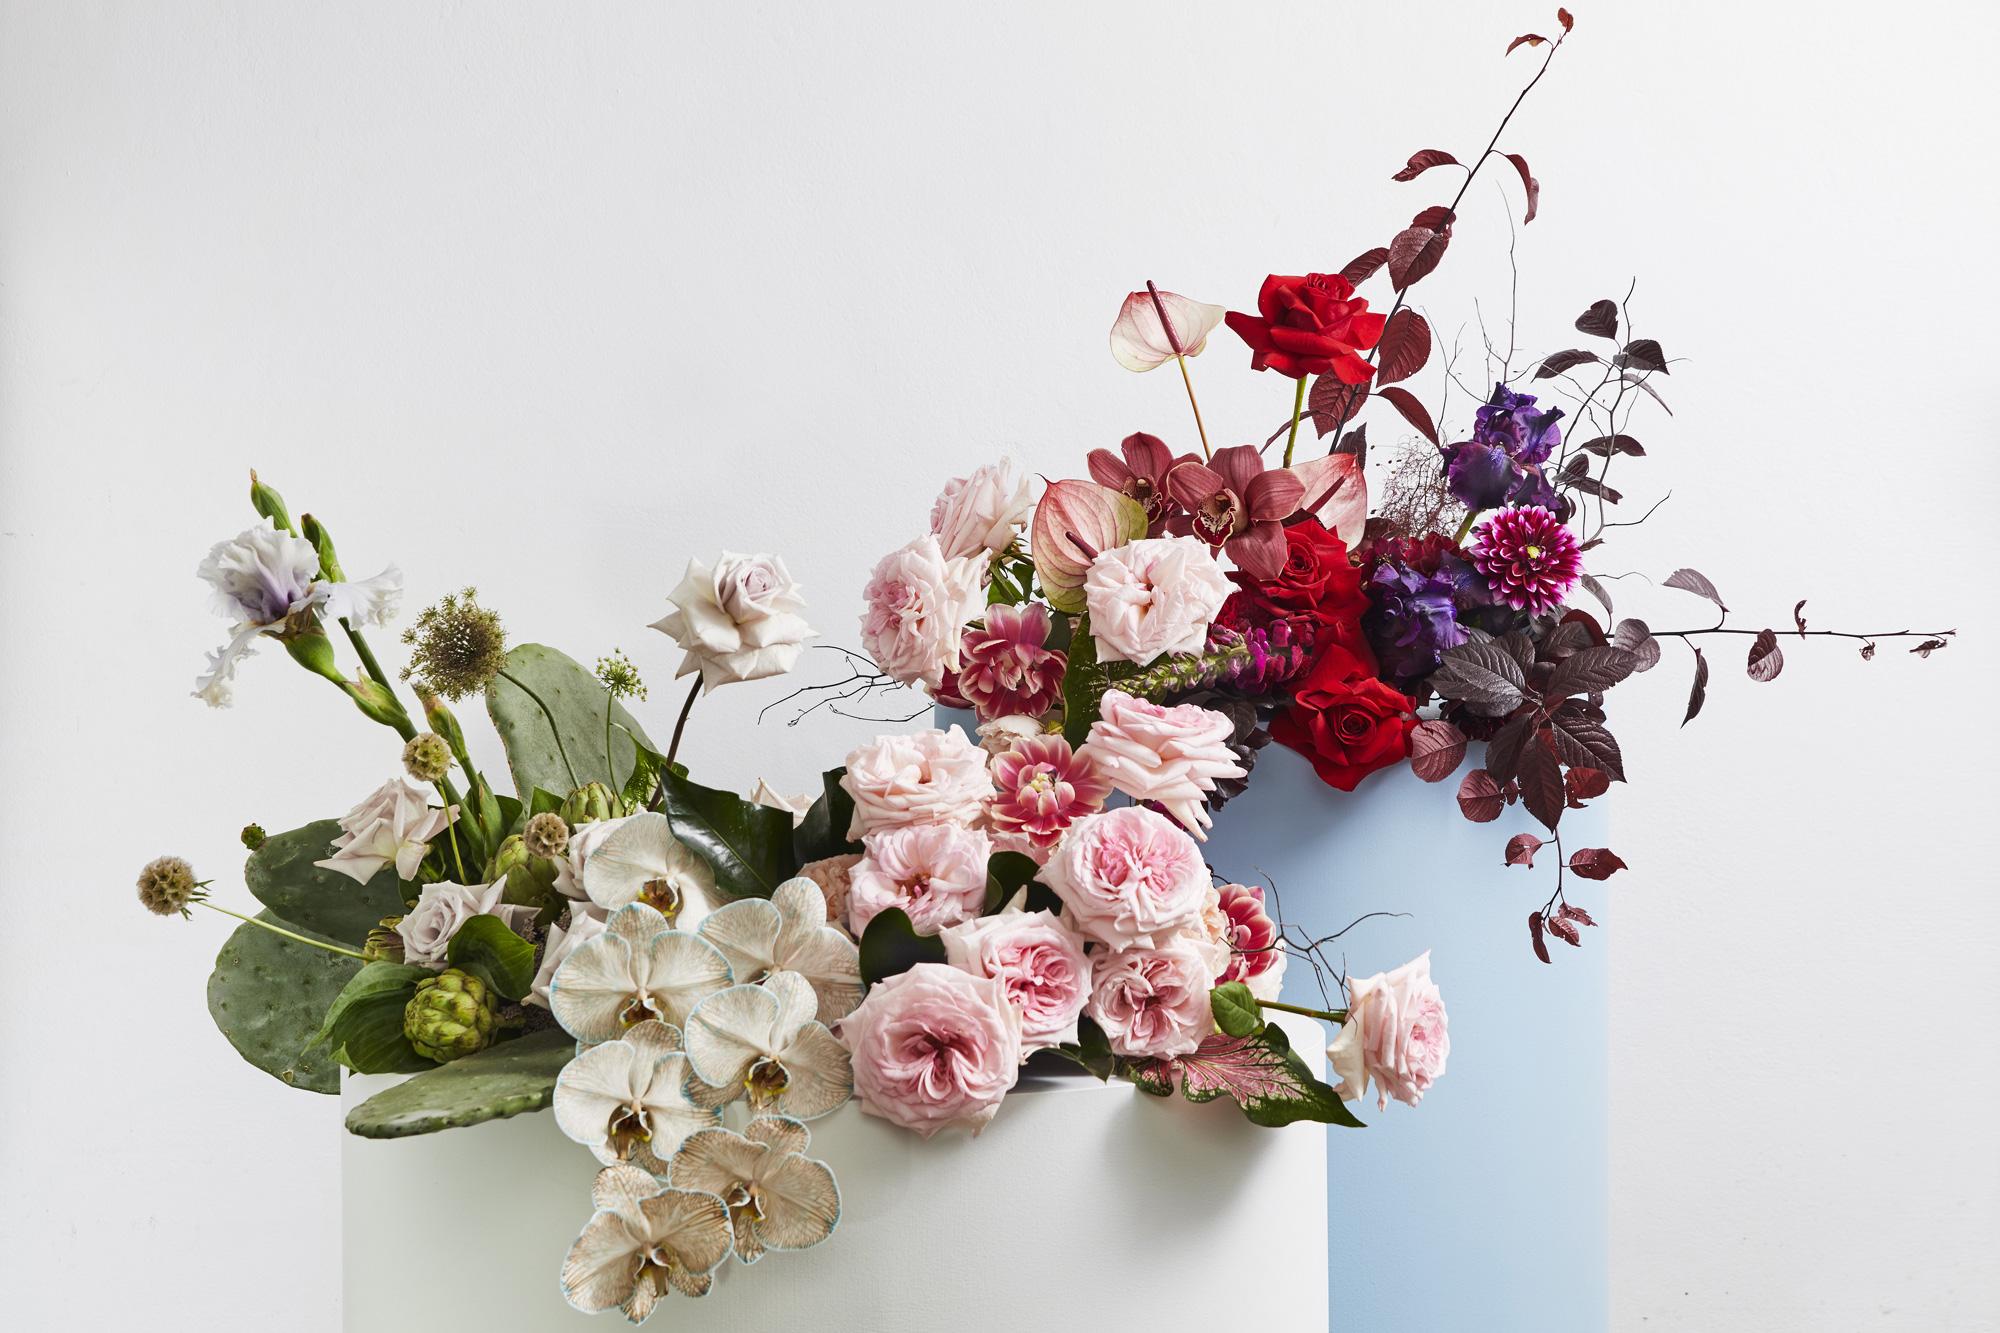 Florist sydney flower shop sydney florist delivery poho5055g izmirmasajfo